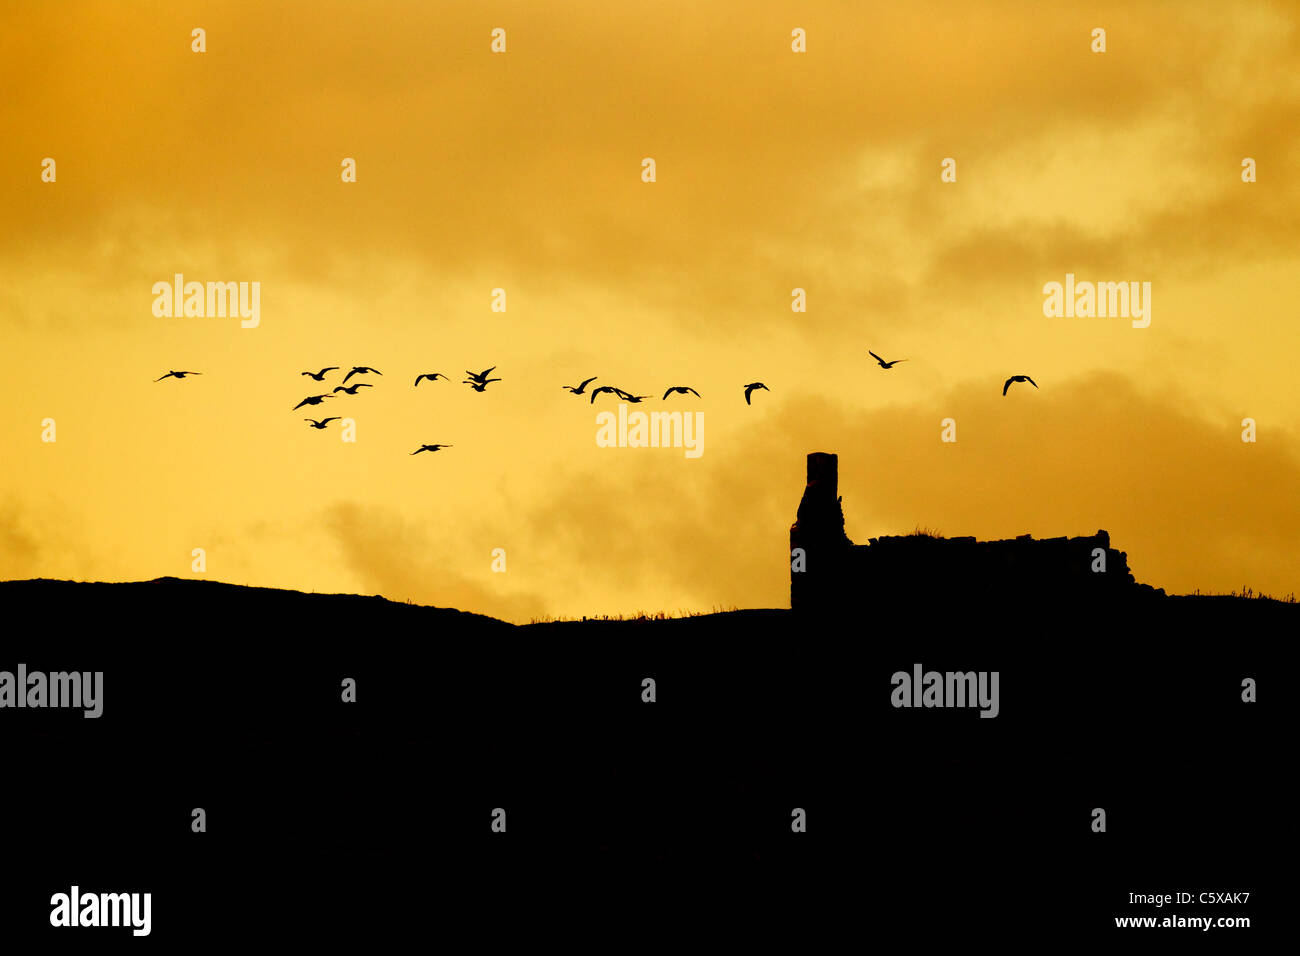 Barnacle Goose - in flight over abandoned croft at dusk Anser leucopsis Islay, Scotland, UK BI020347 - Stock Image